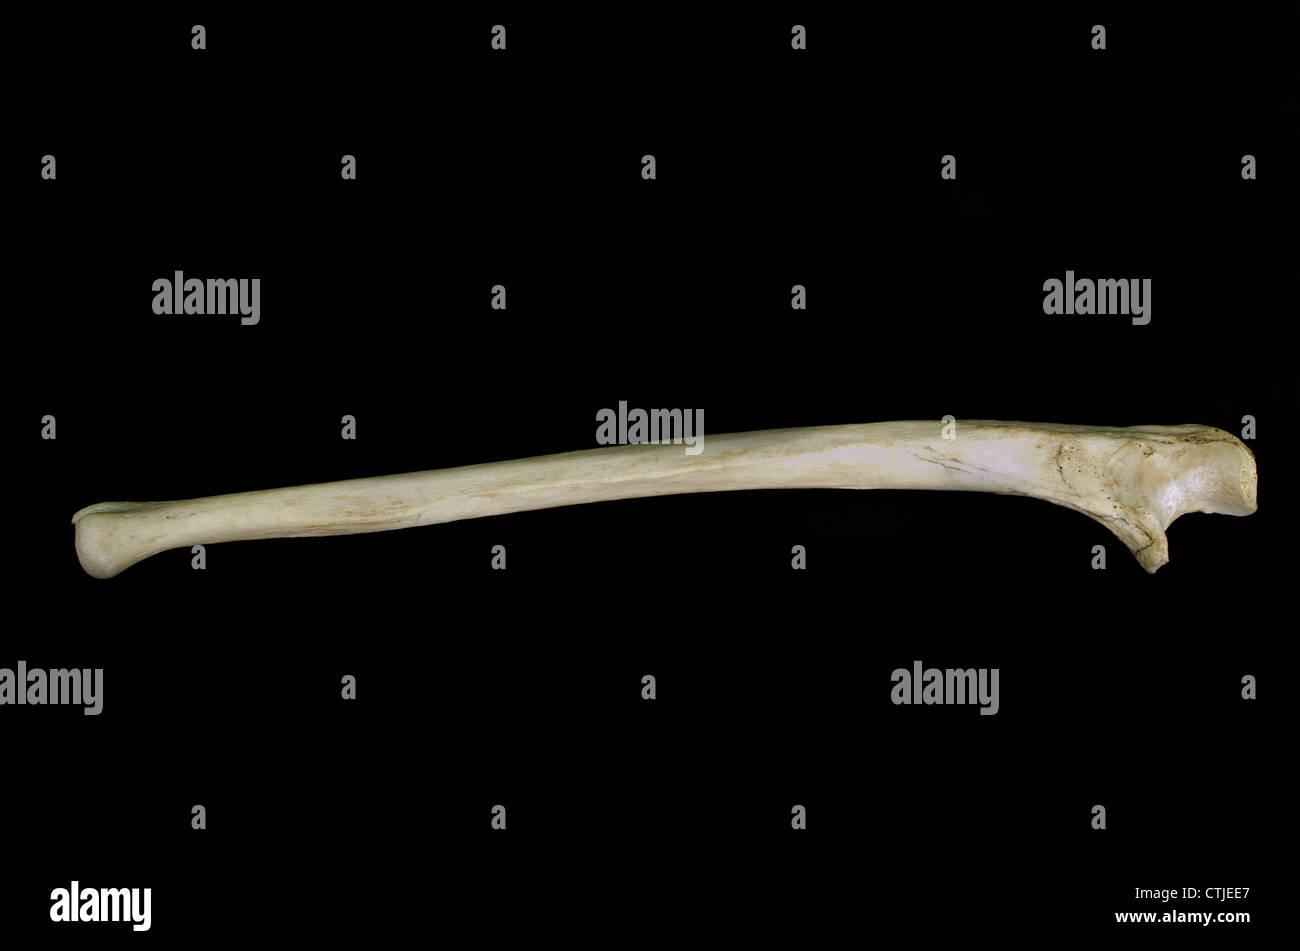 Human Ulna Bone Stock Photos Human Ulna Bone Stock Images Alamy